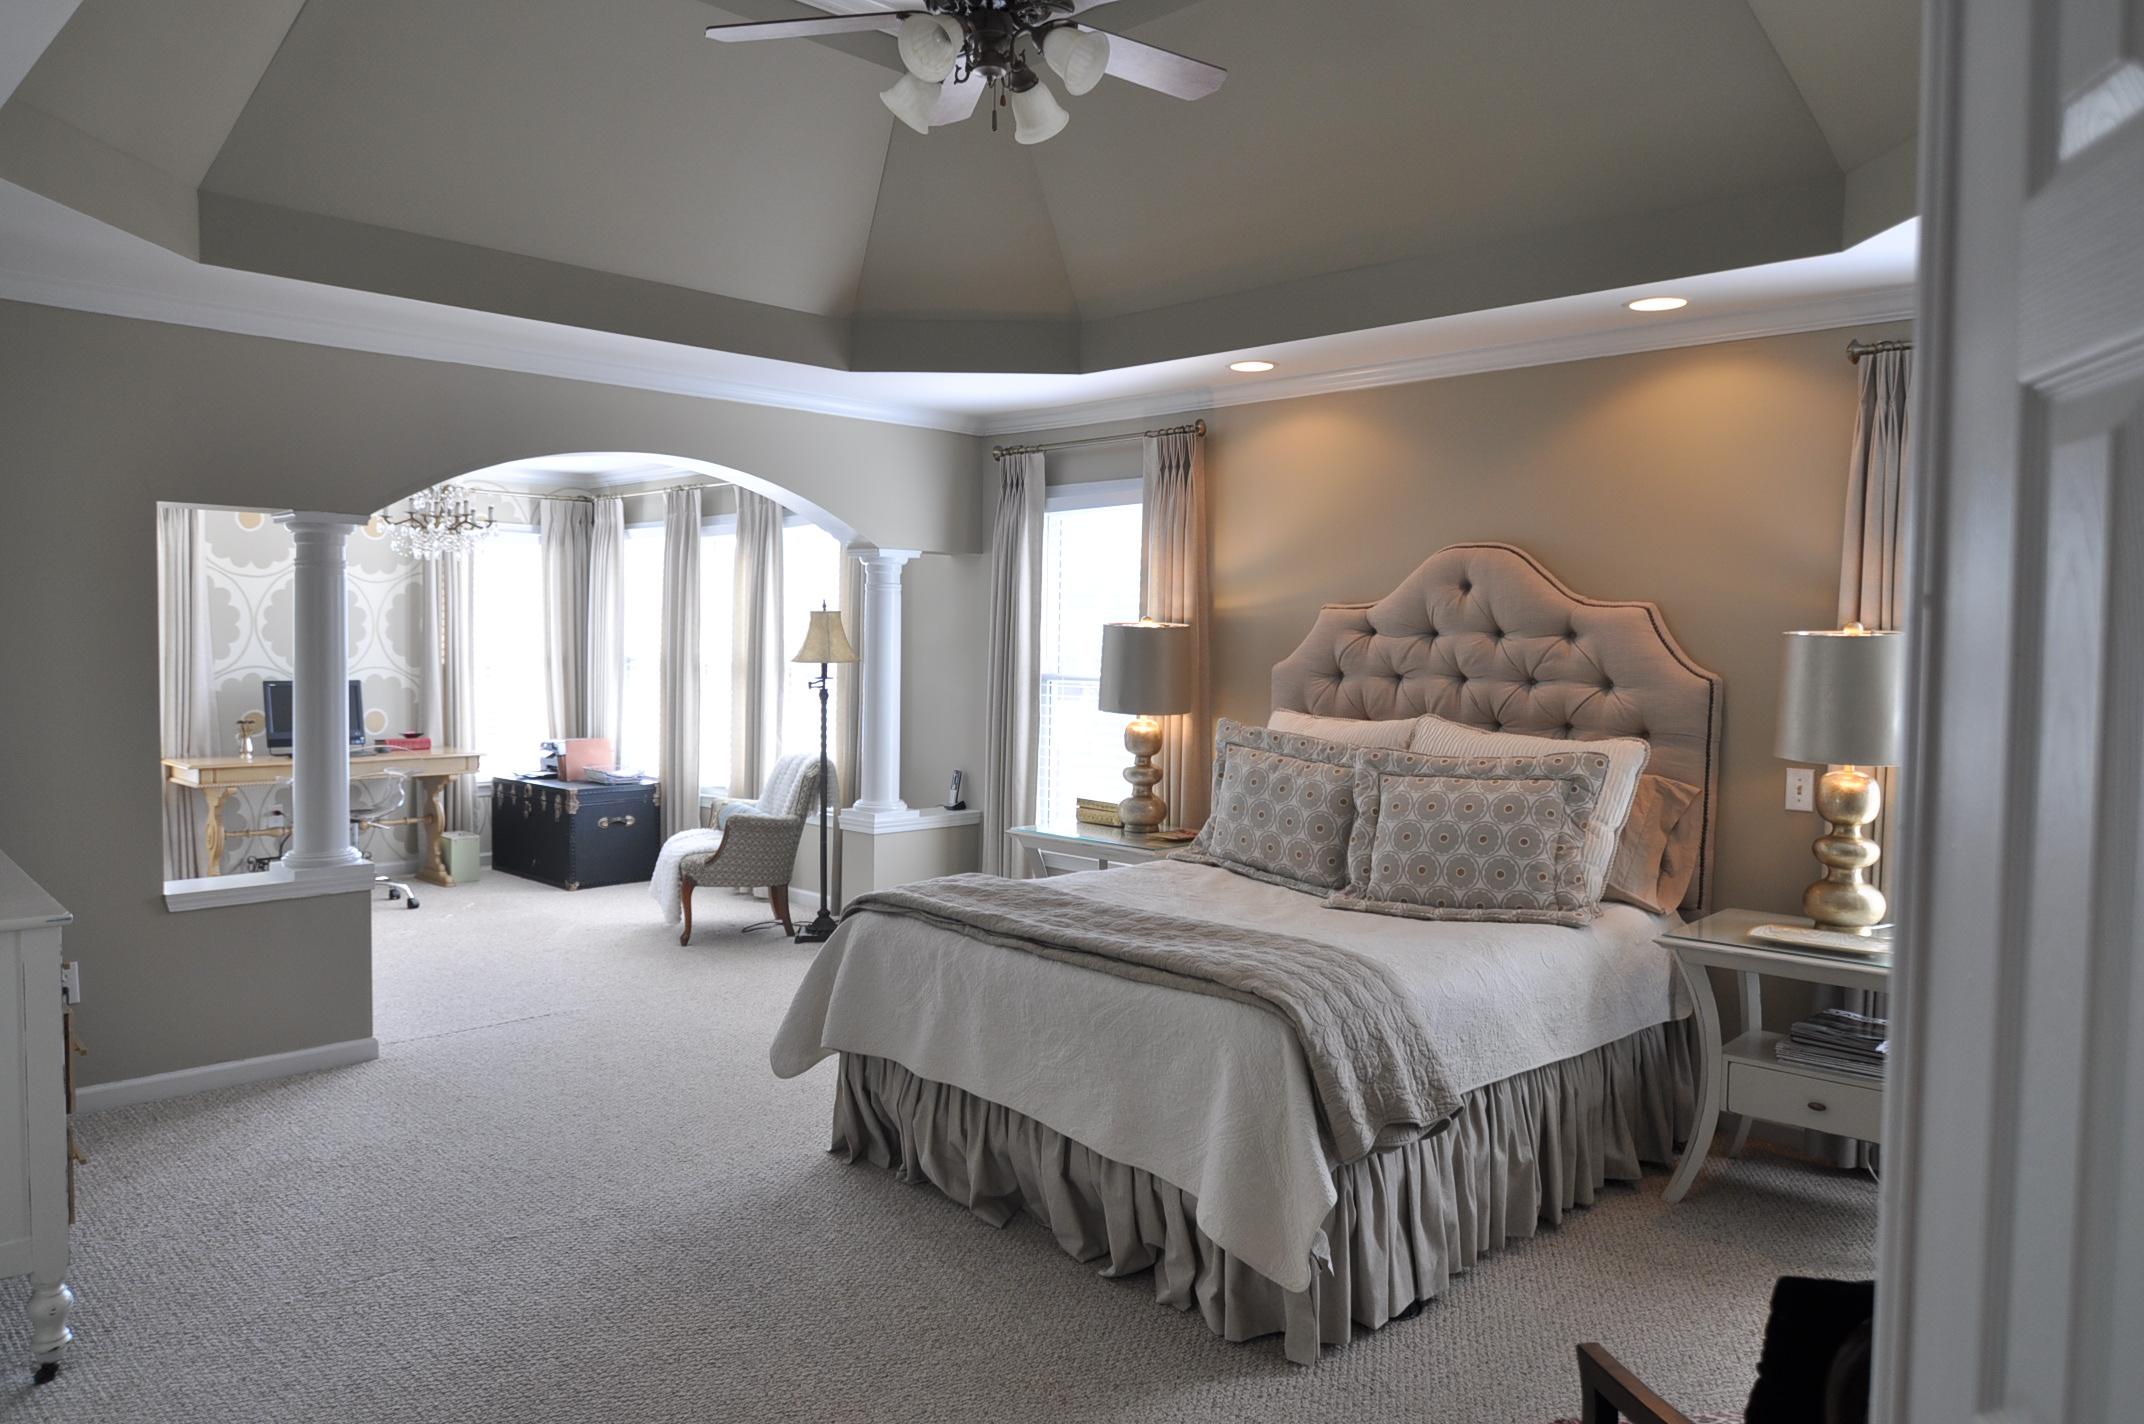 Rosemary's bedroom